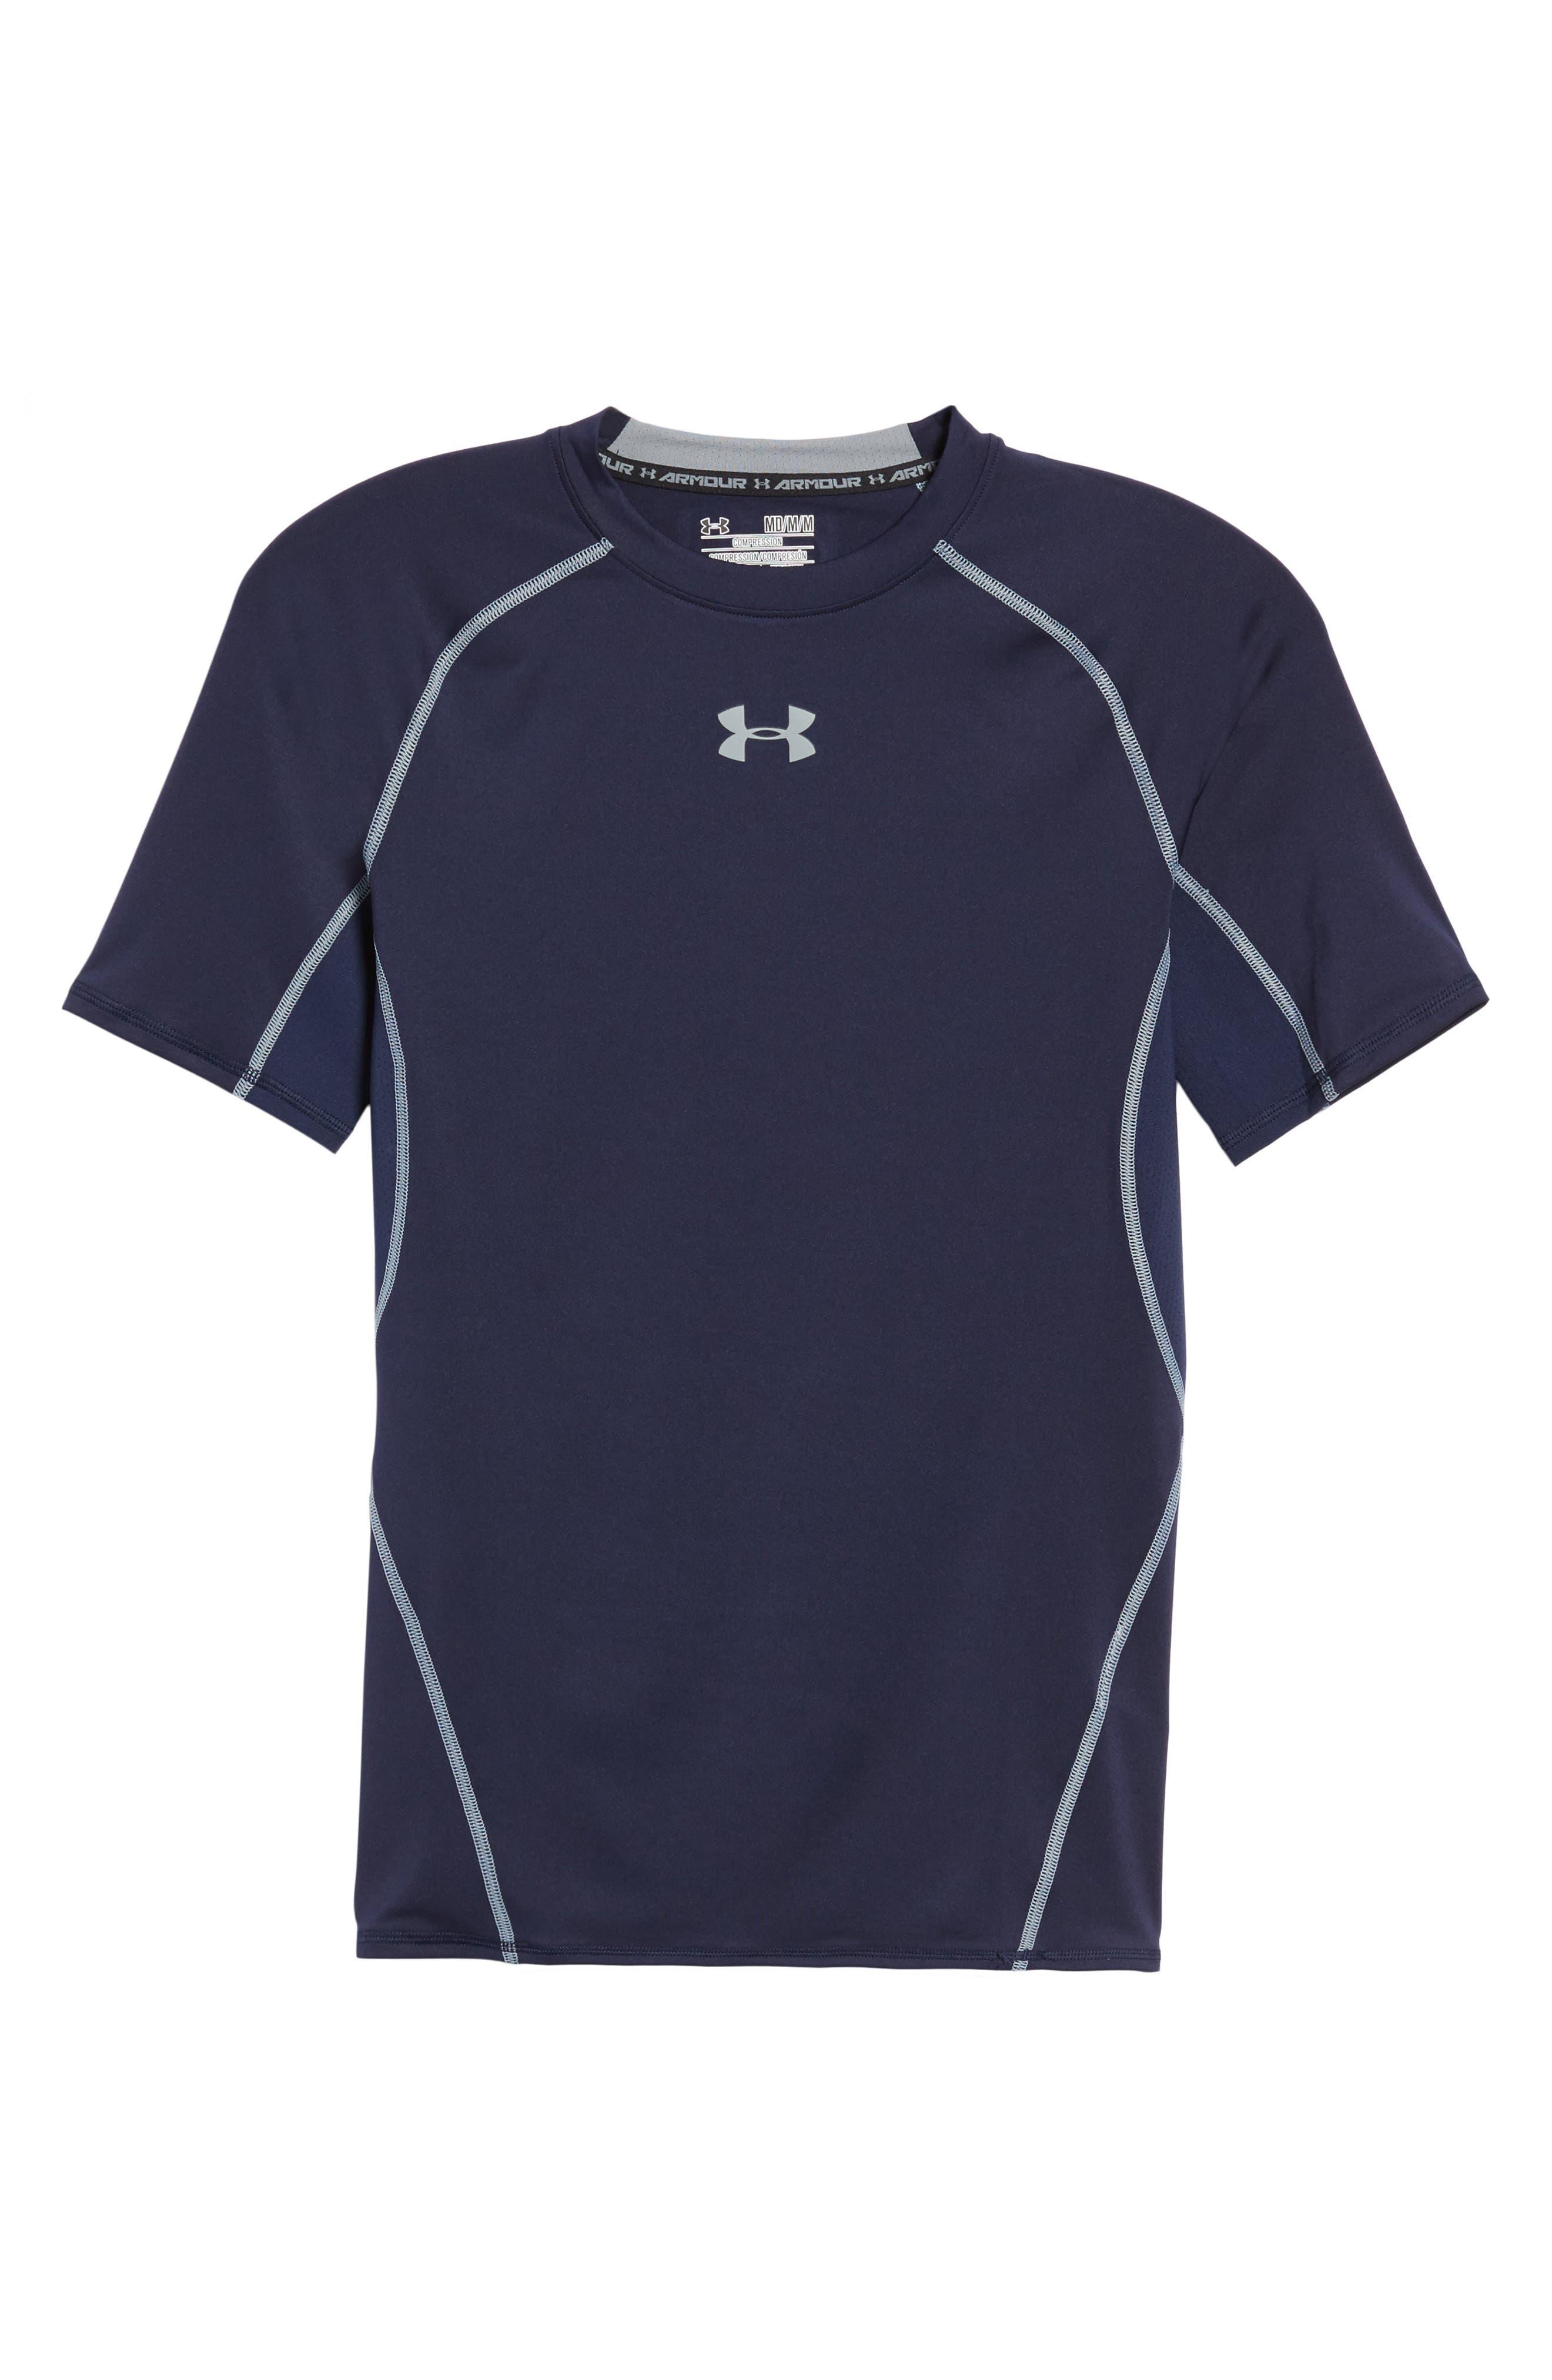 Under Armour Heatgear Compression Fit T-Shirt, Blue